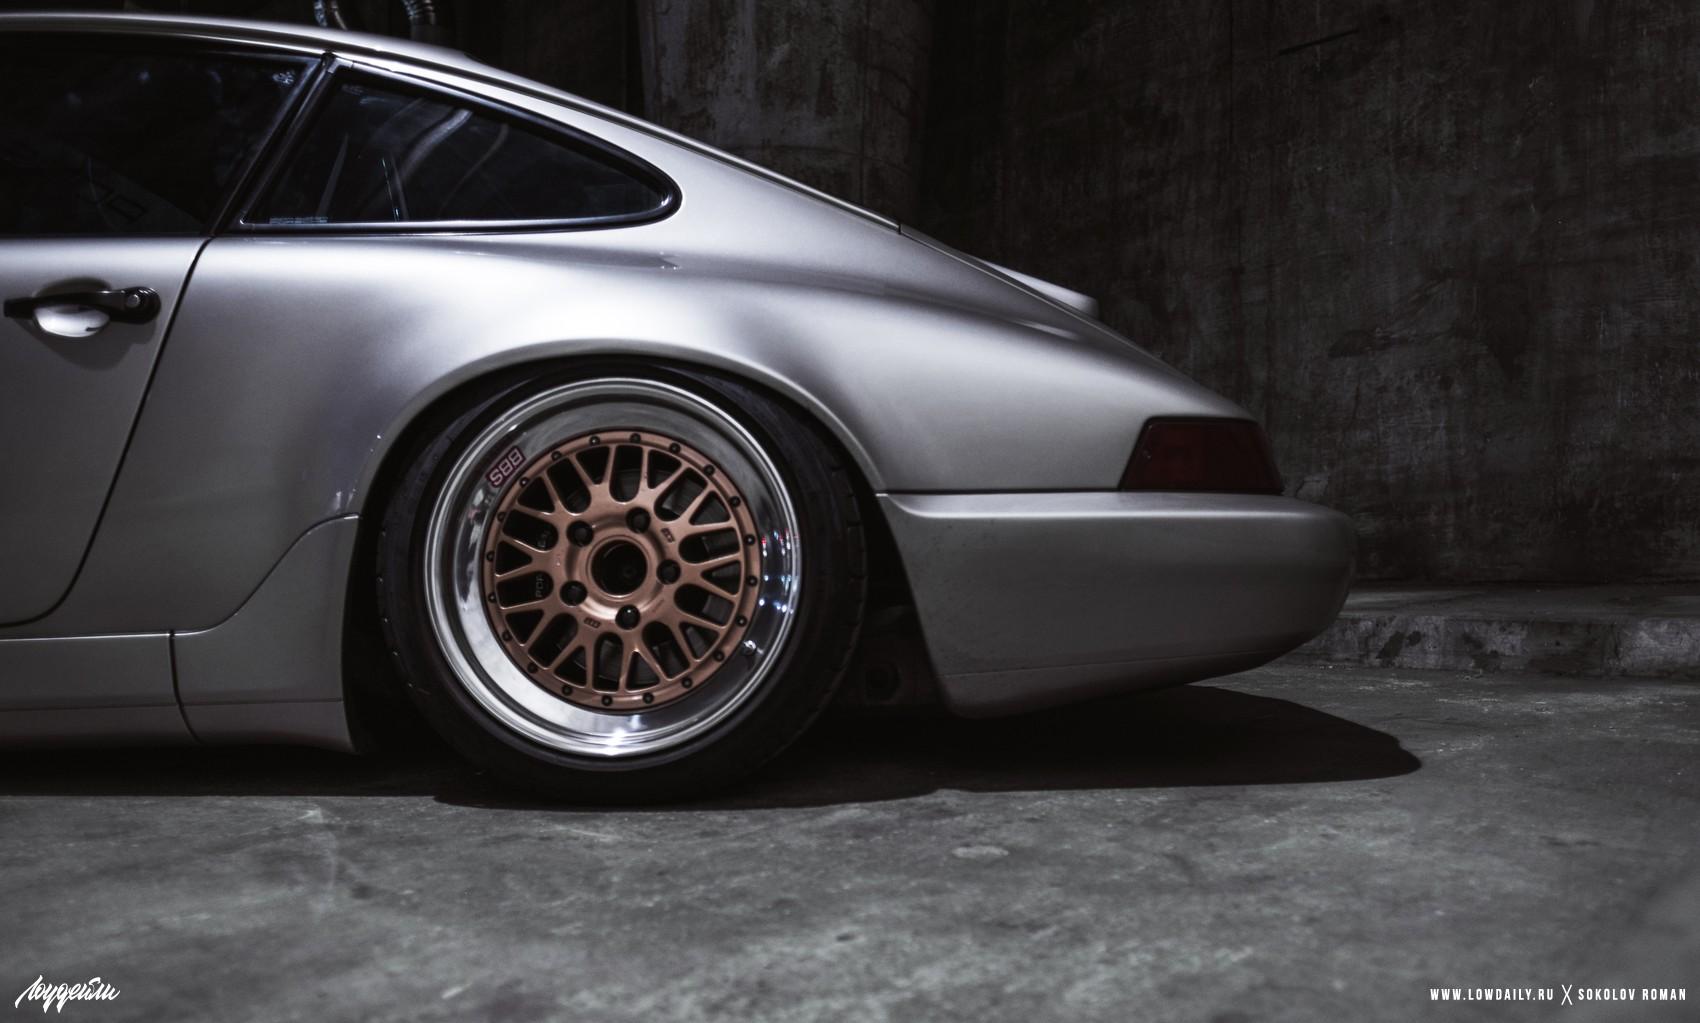 1989 Porsche Carrera 4 (964) DSCF3281